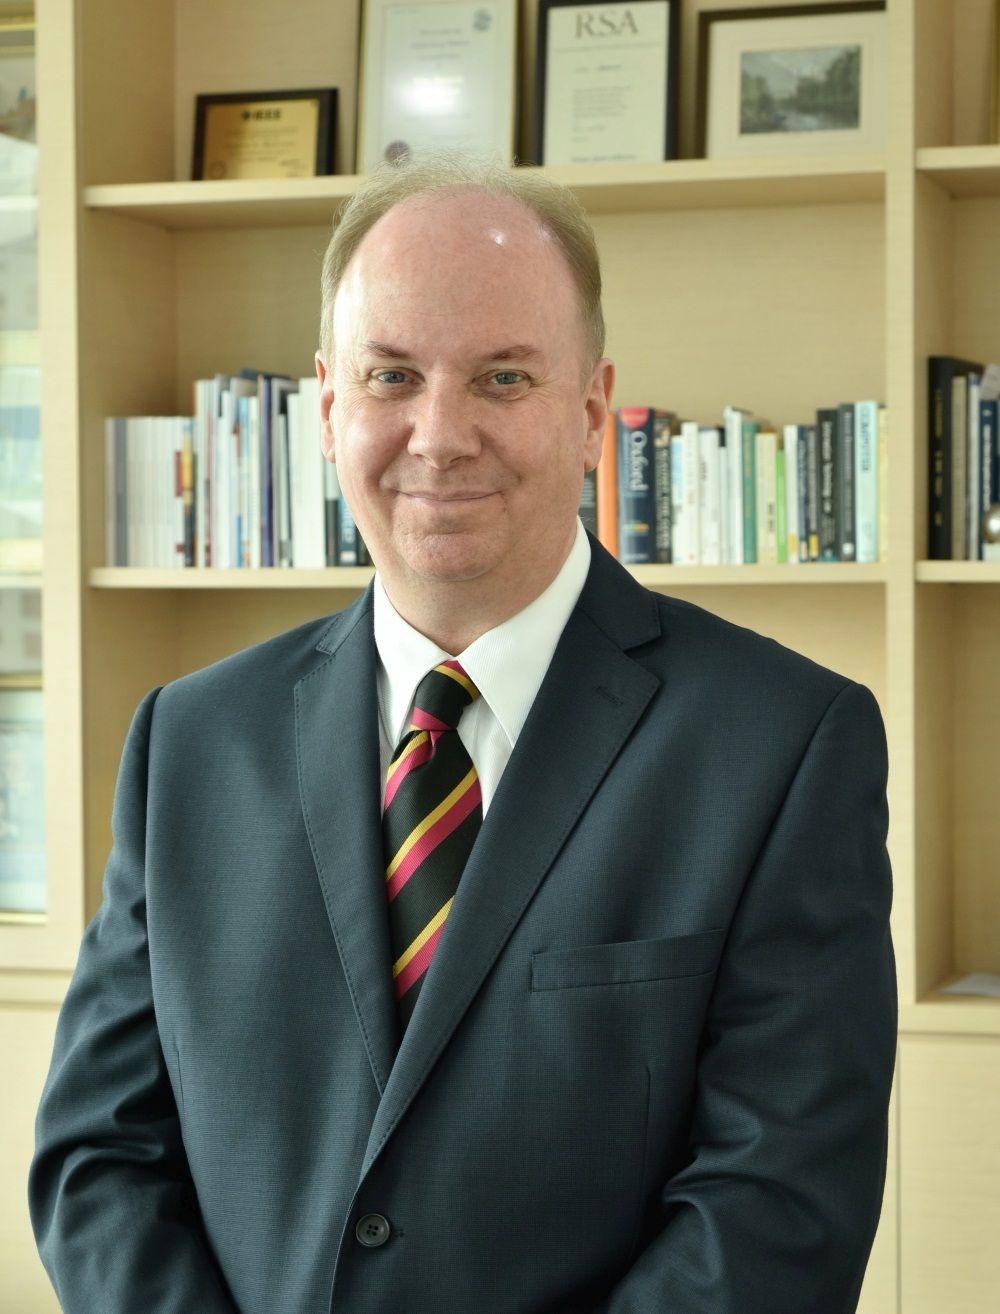 Sunway University vice chancellor Prof Graeme Wilkinson